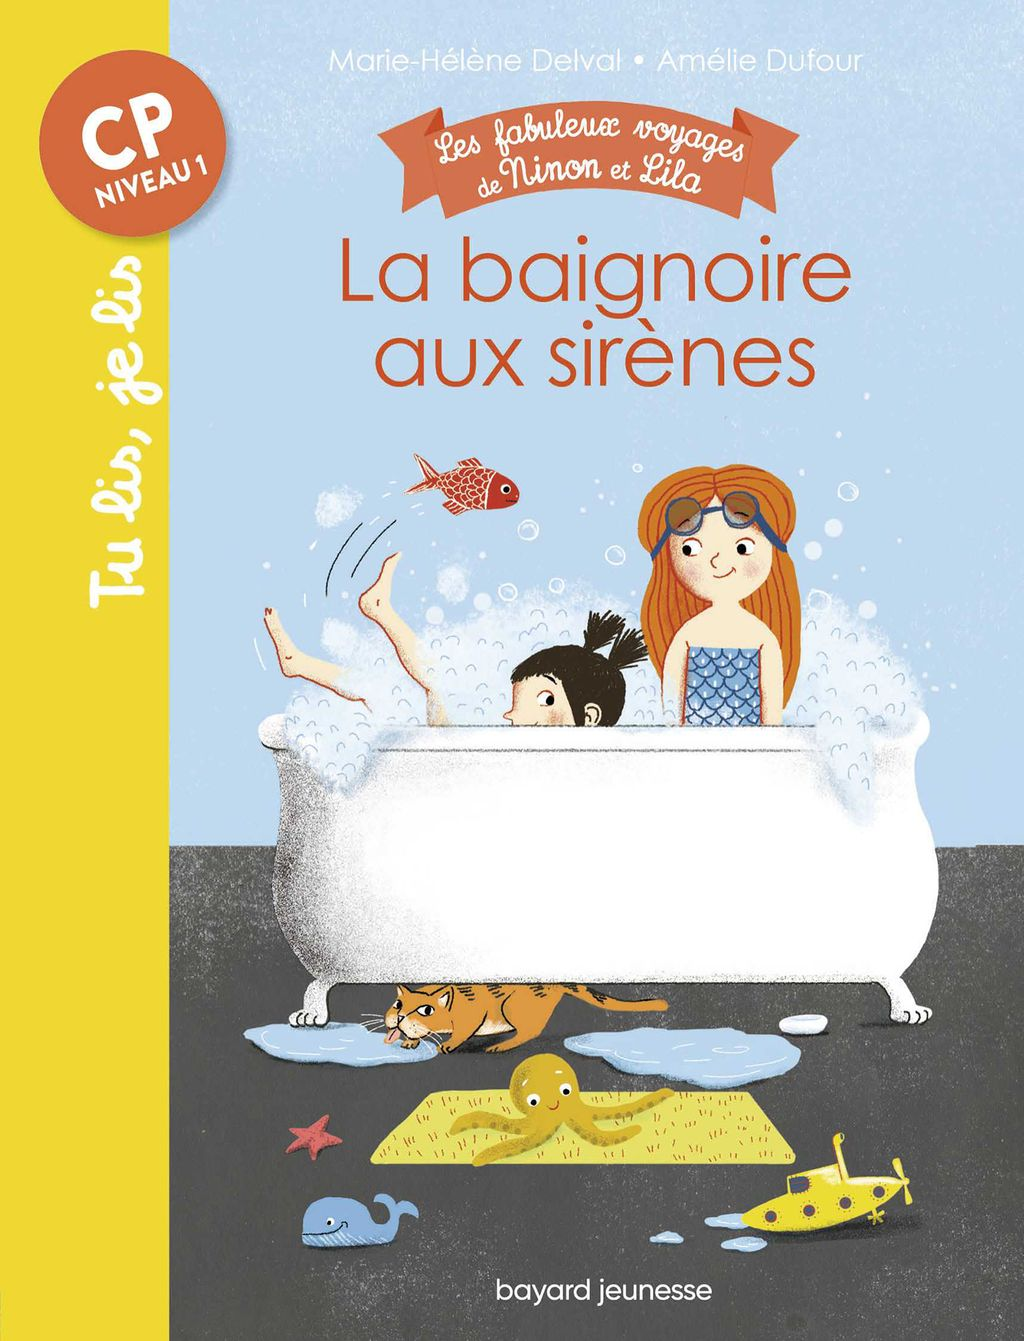 «La baignoire aux sirènes» cover